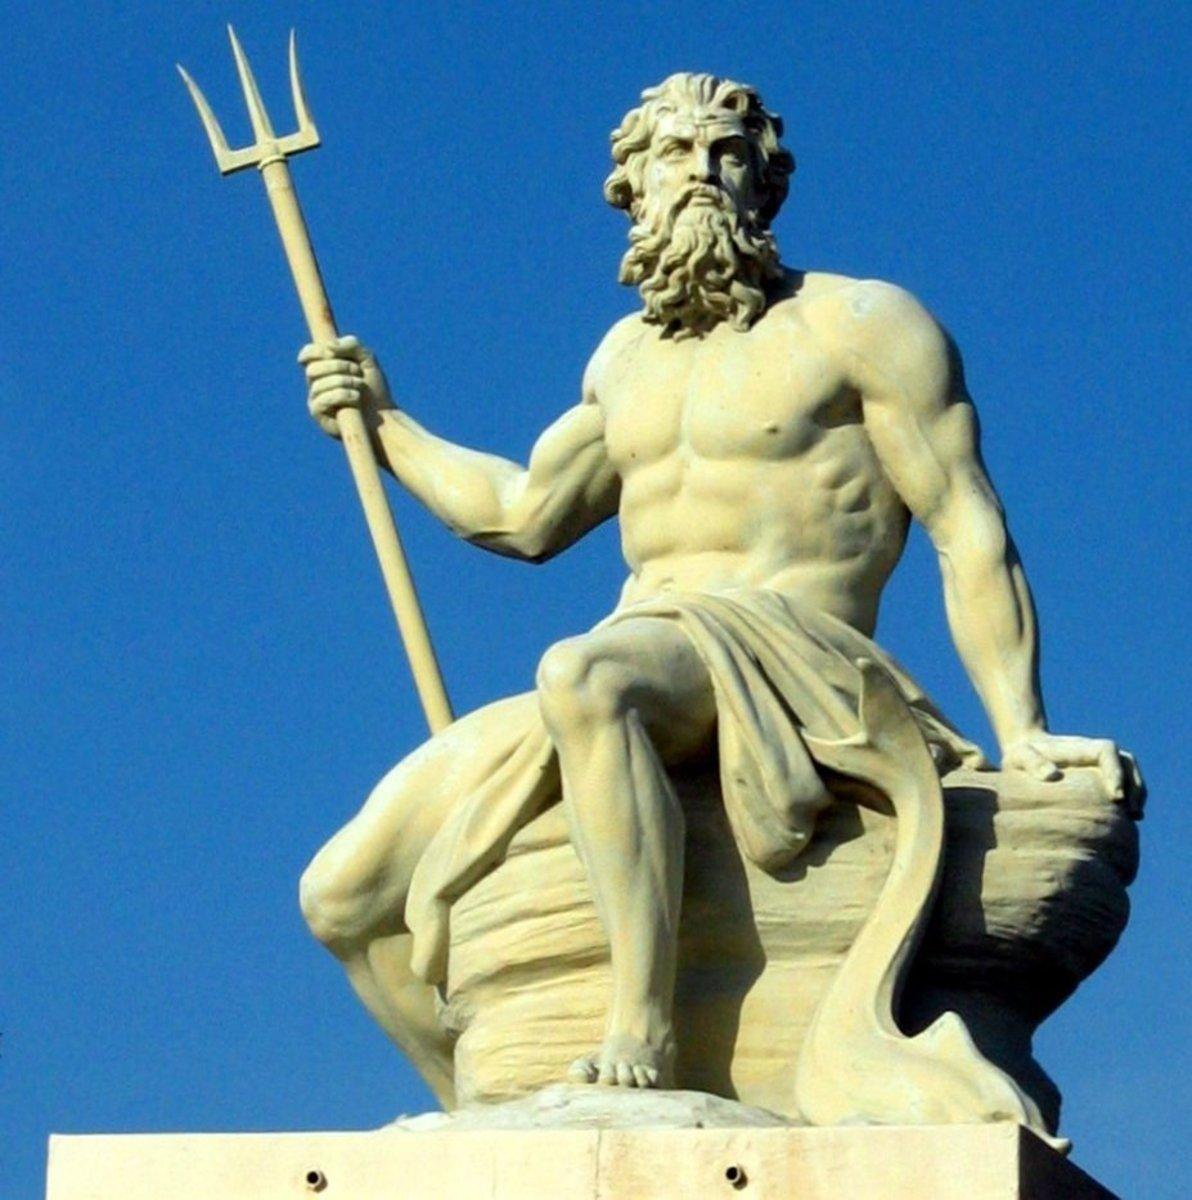 A sculpture of Poseidon in the port of Copenhagen